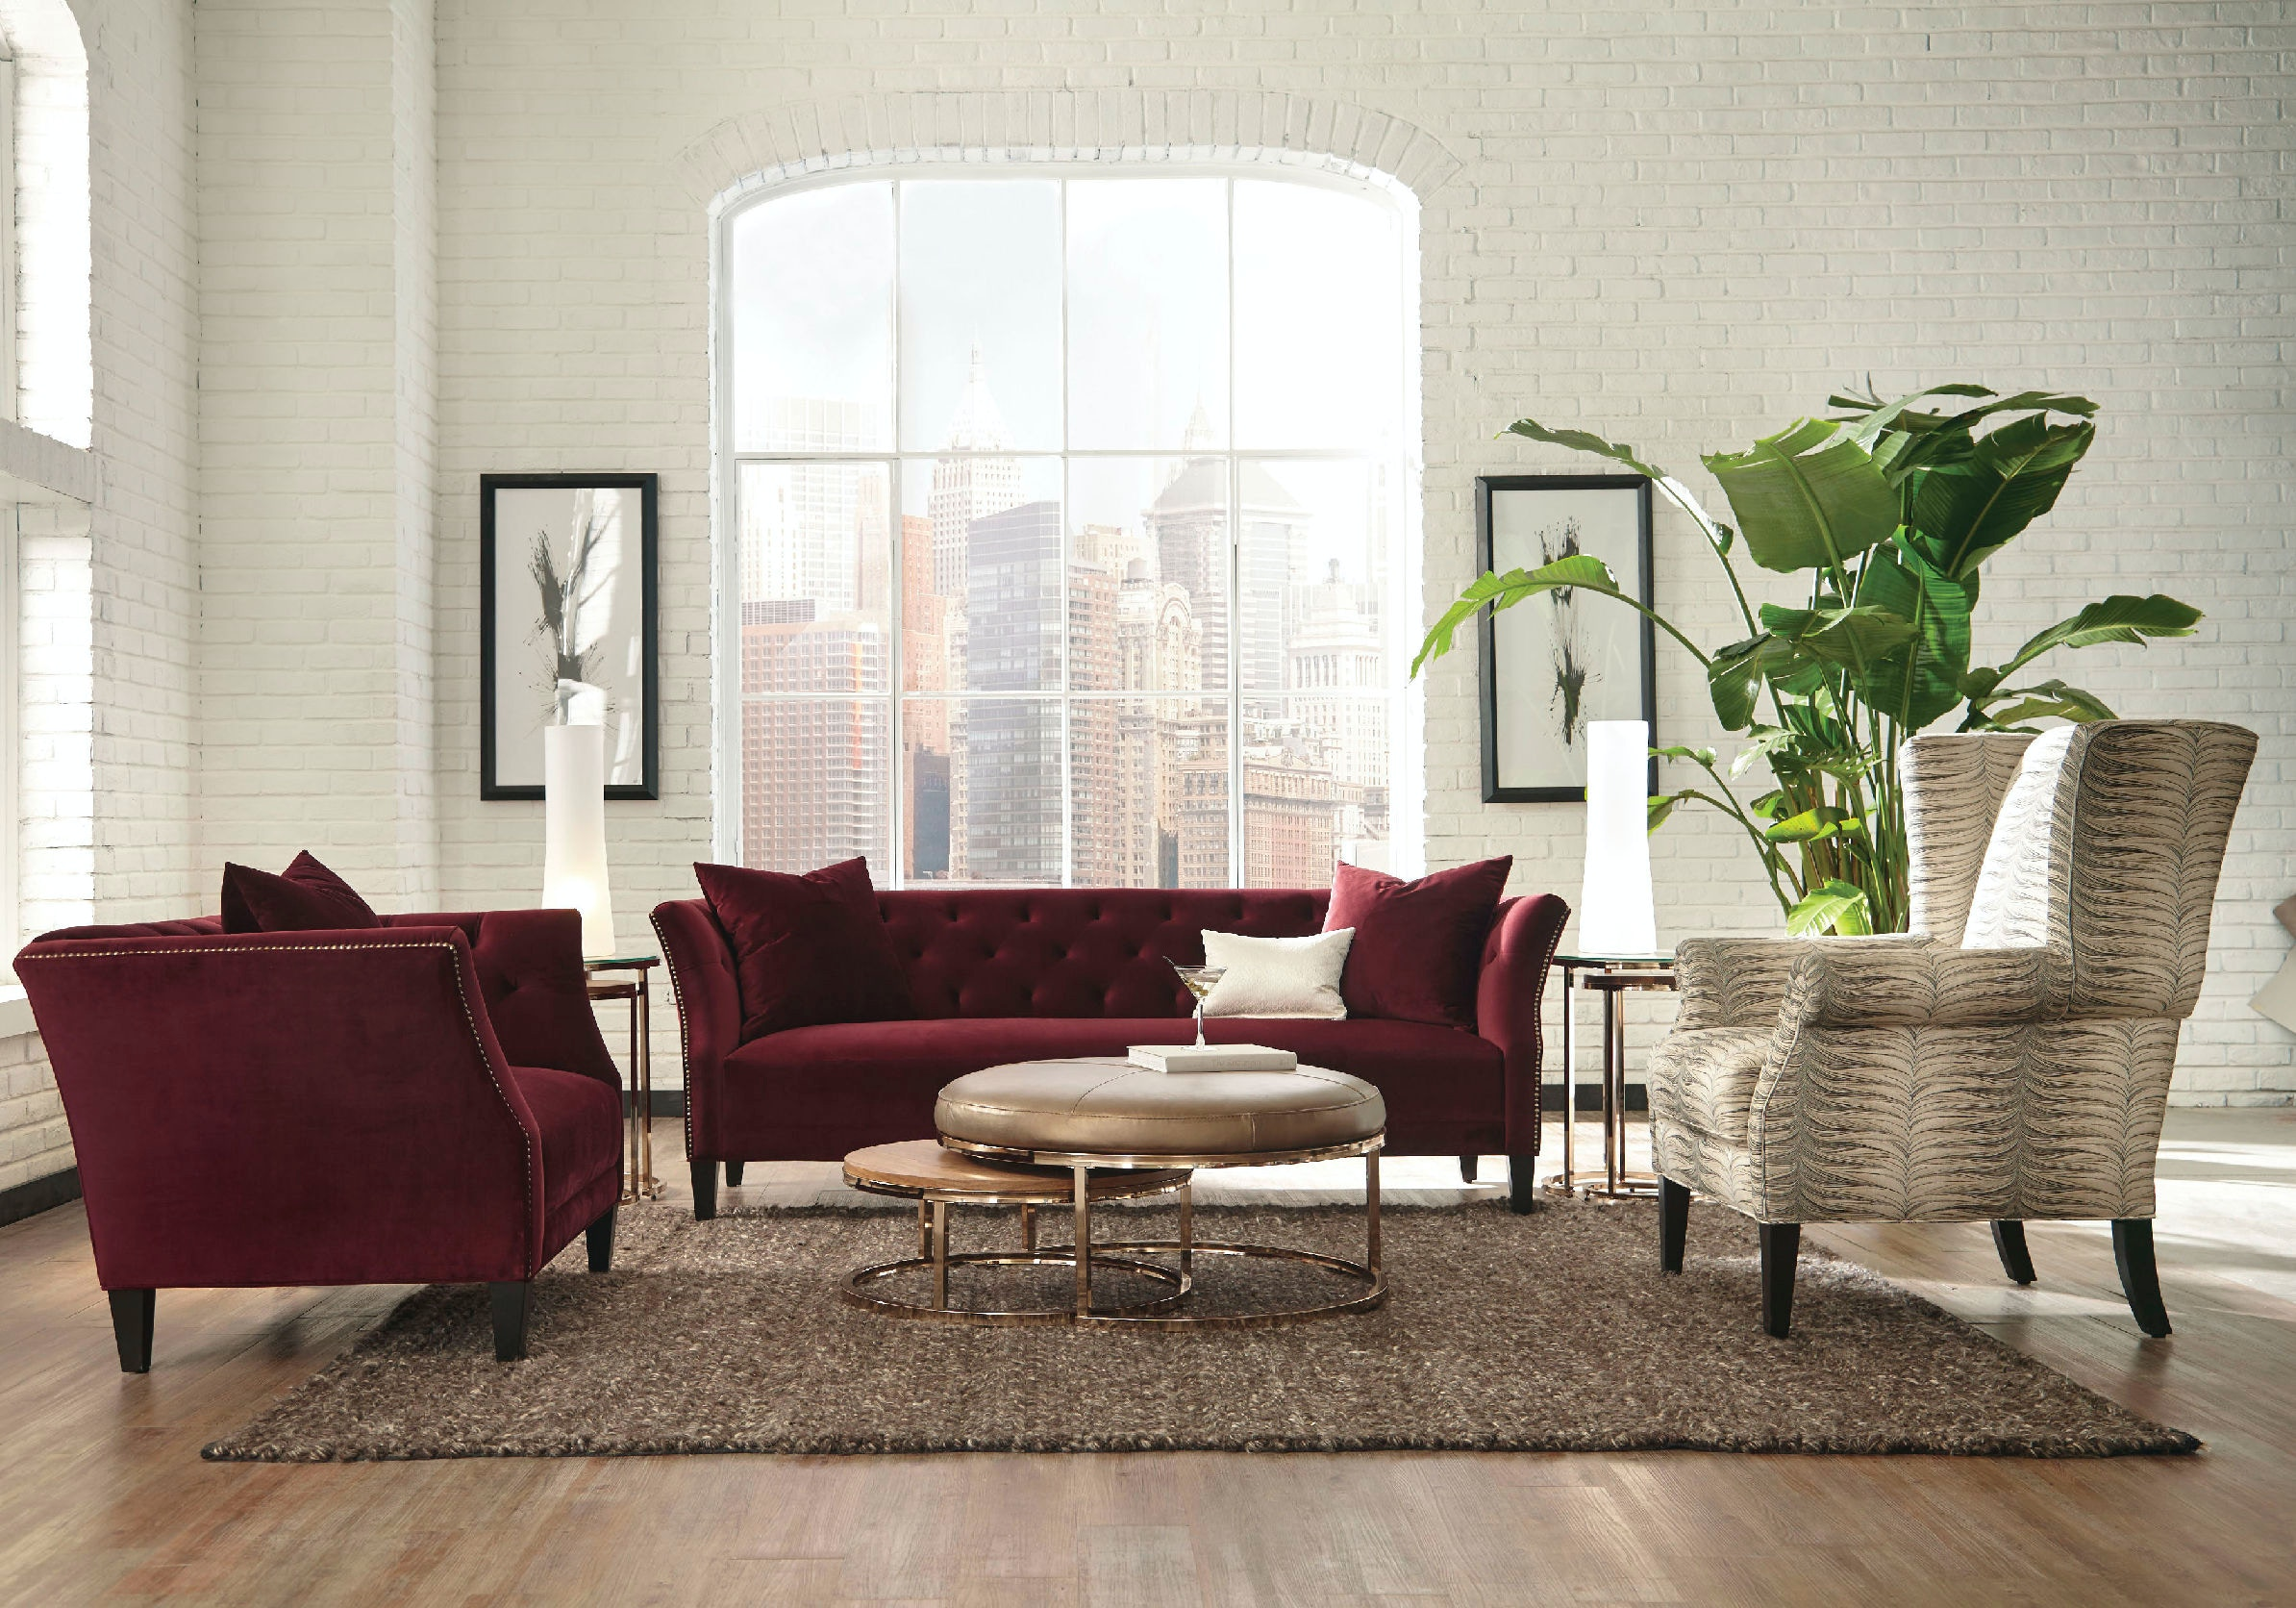 17430. Sofa · Carol House Discount Price $847.00